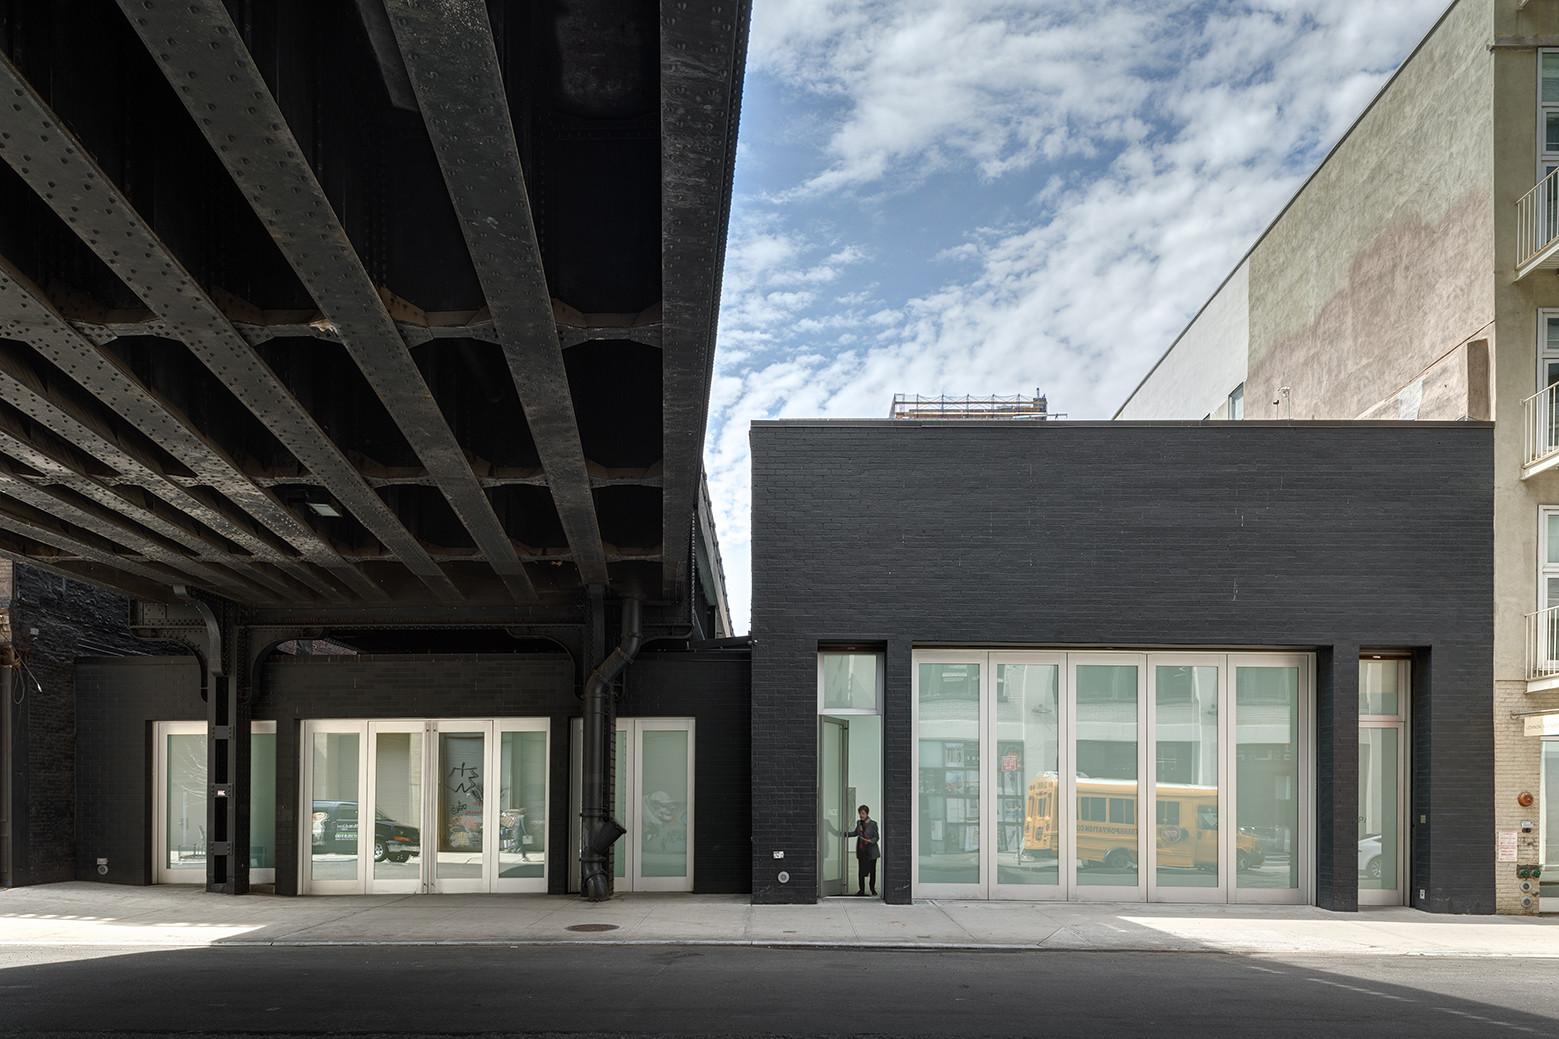 Pace Gallery / HS2 Architecture, © Rafael Gamo